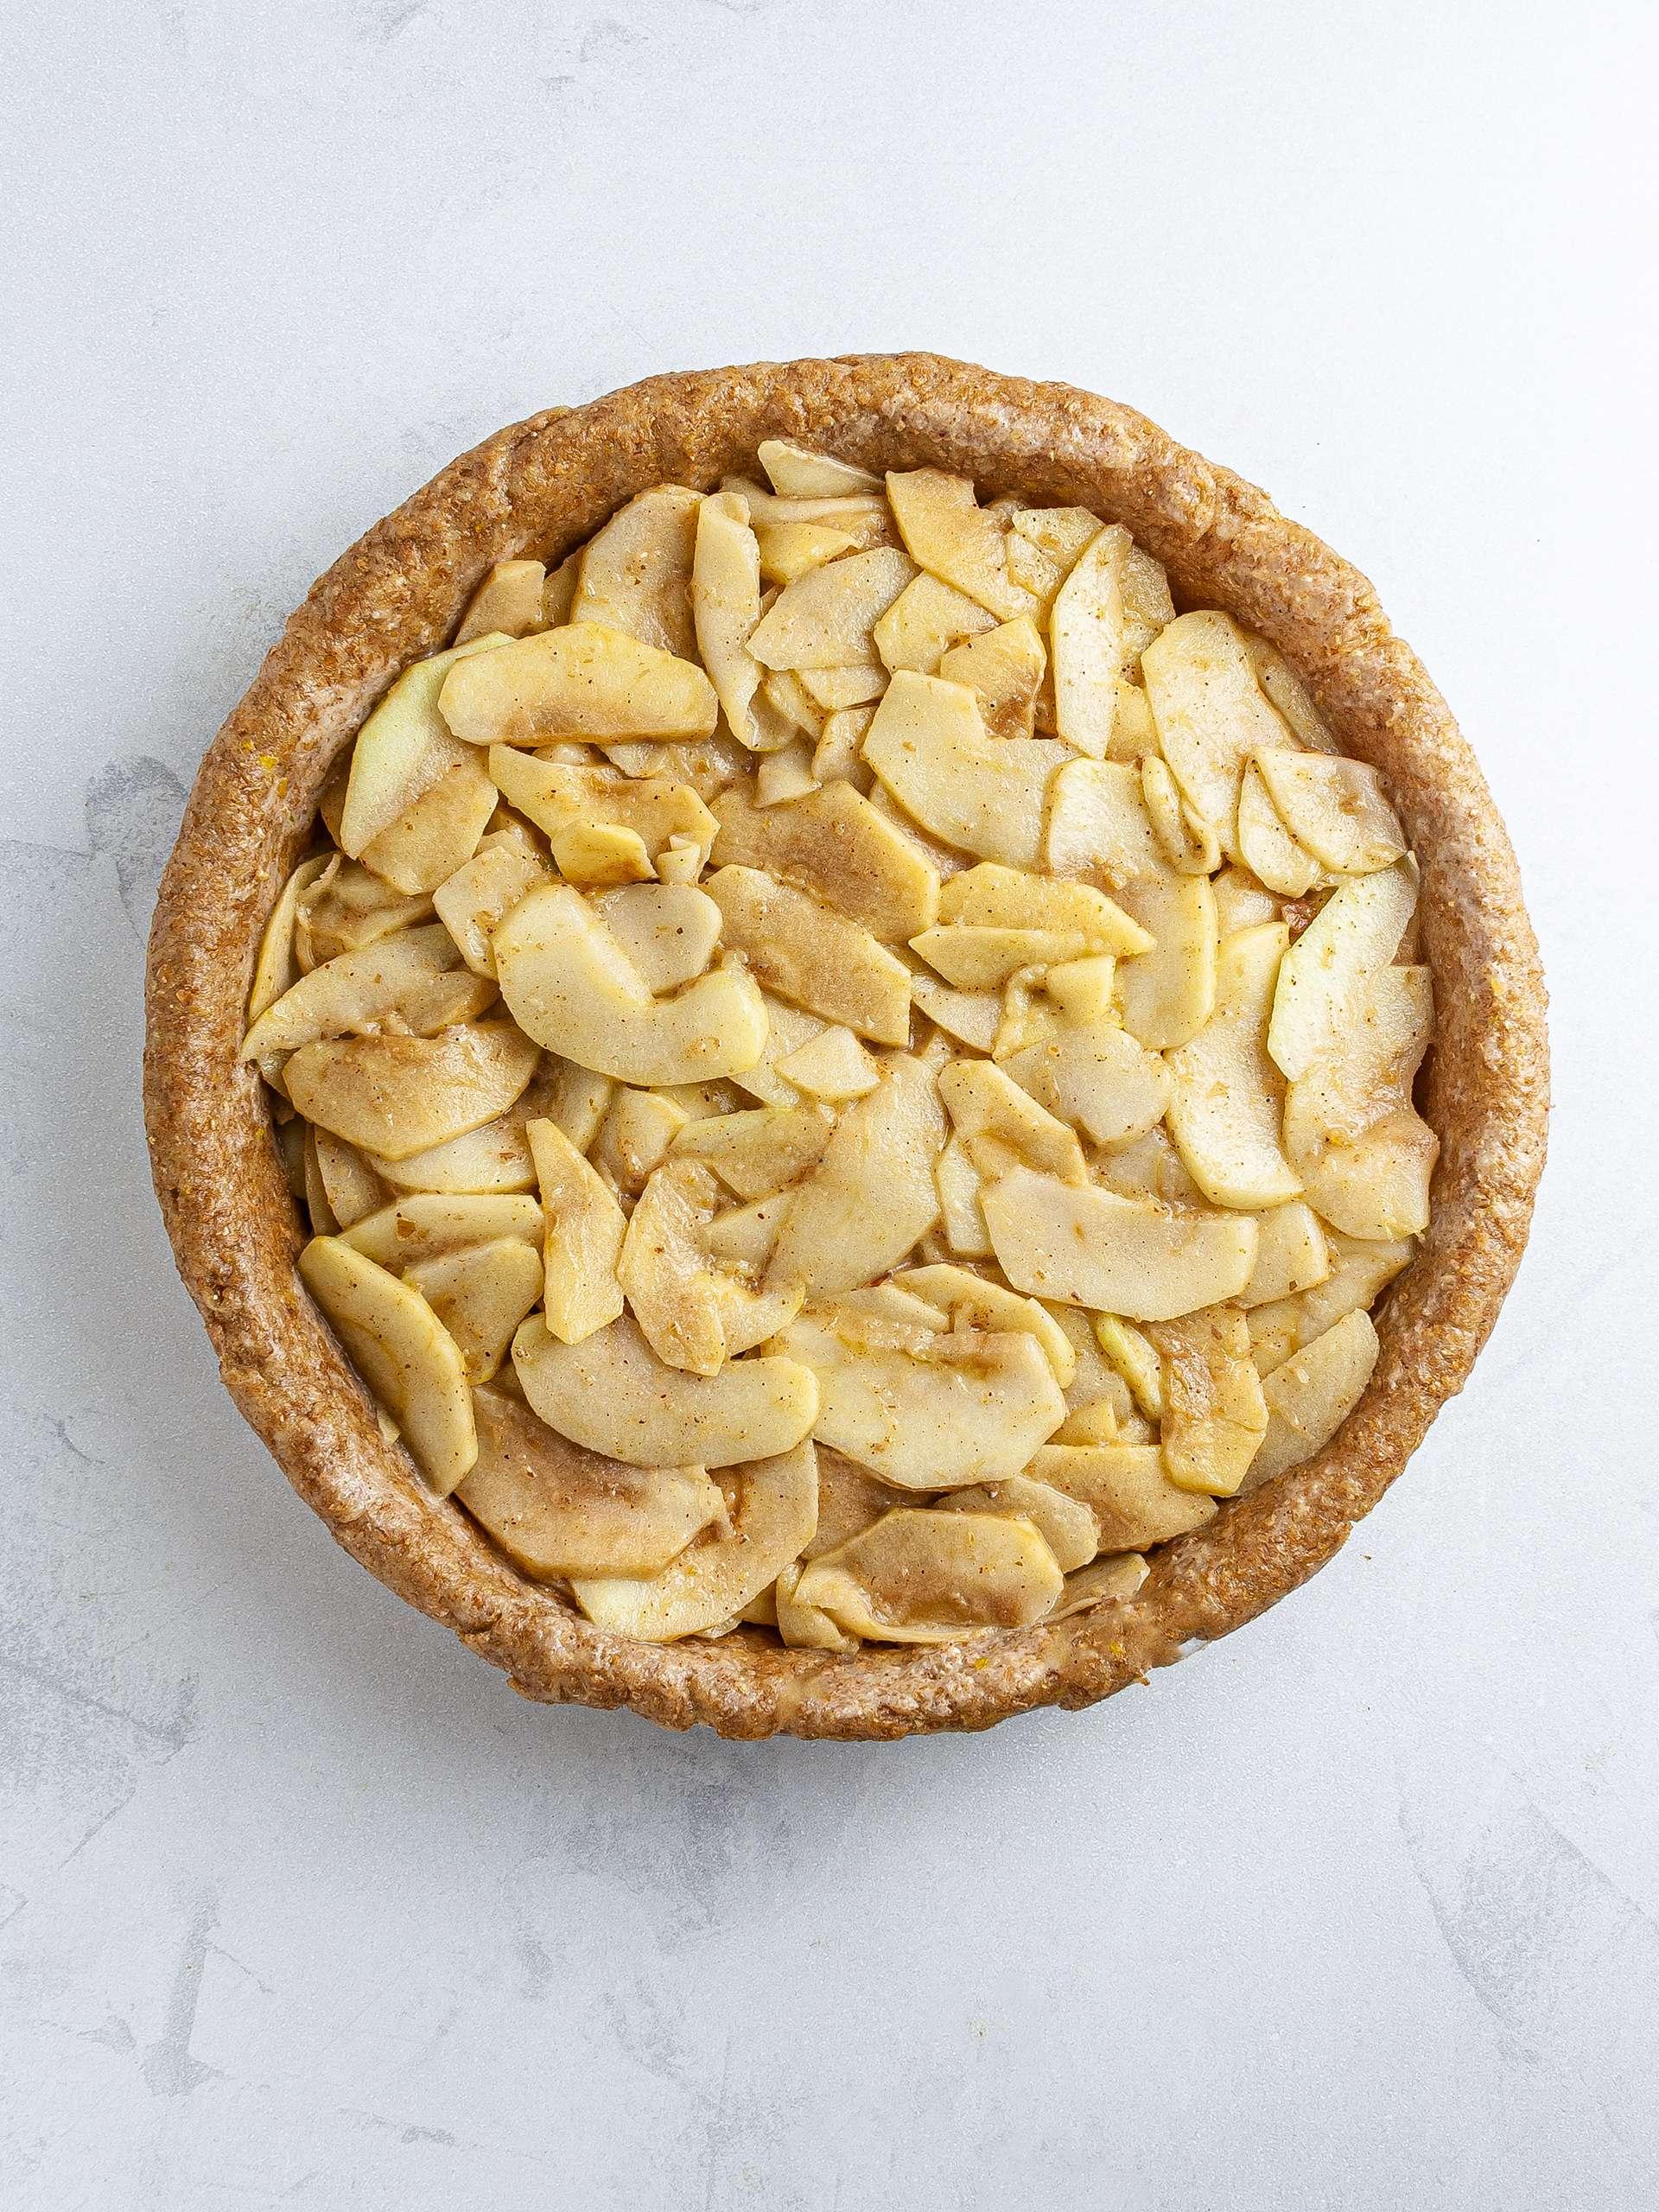 Step 4.2 of Vegan Apple Pie Recipe